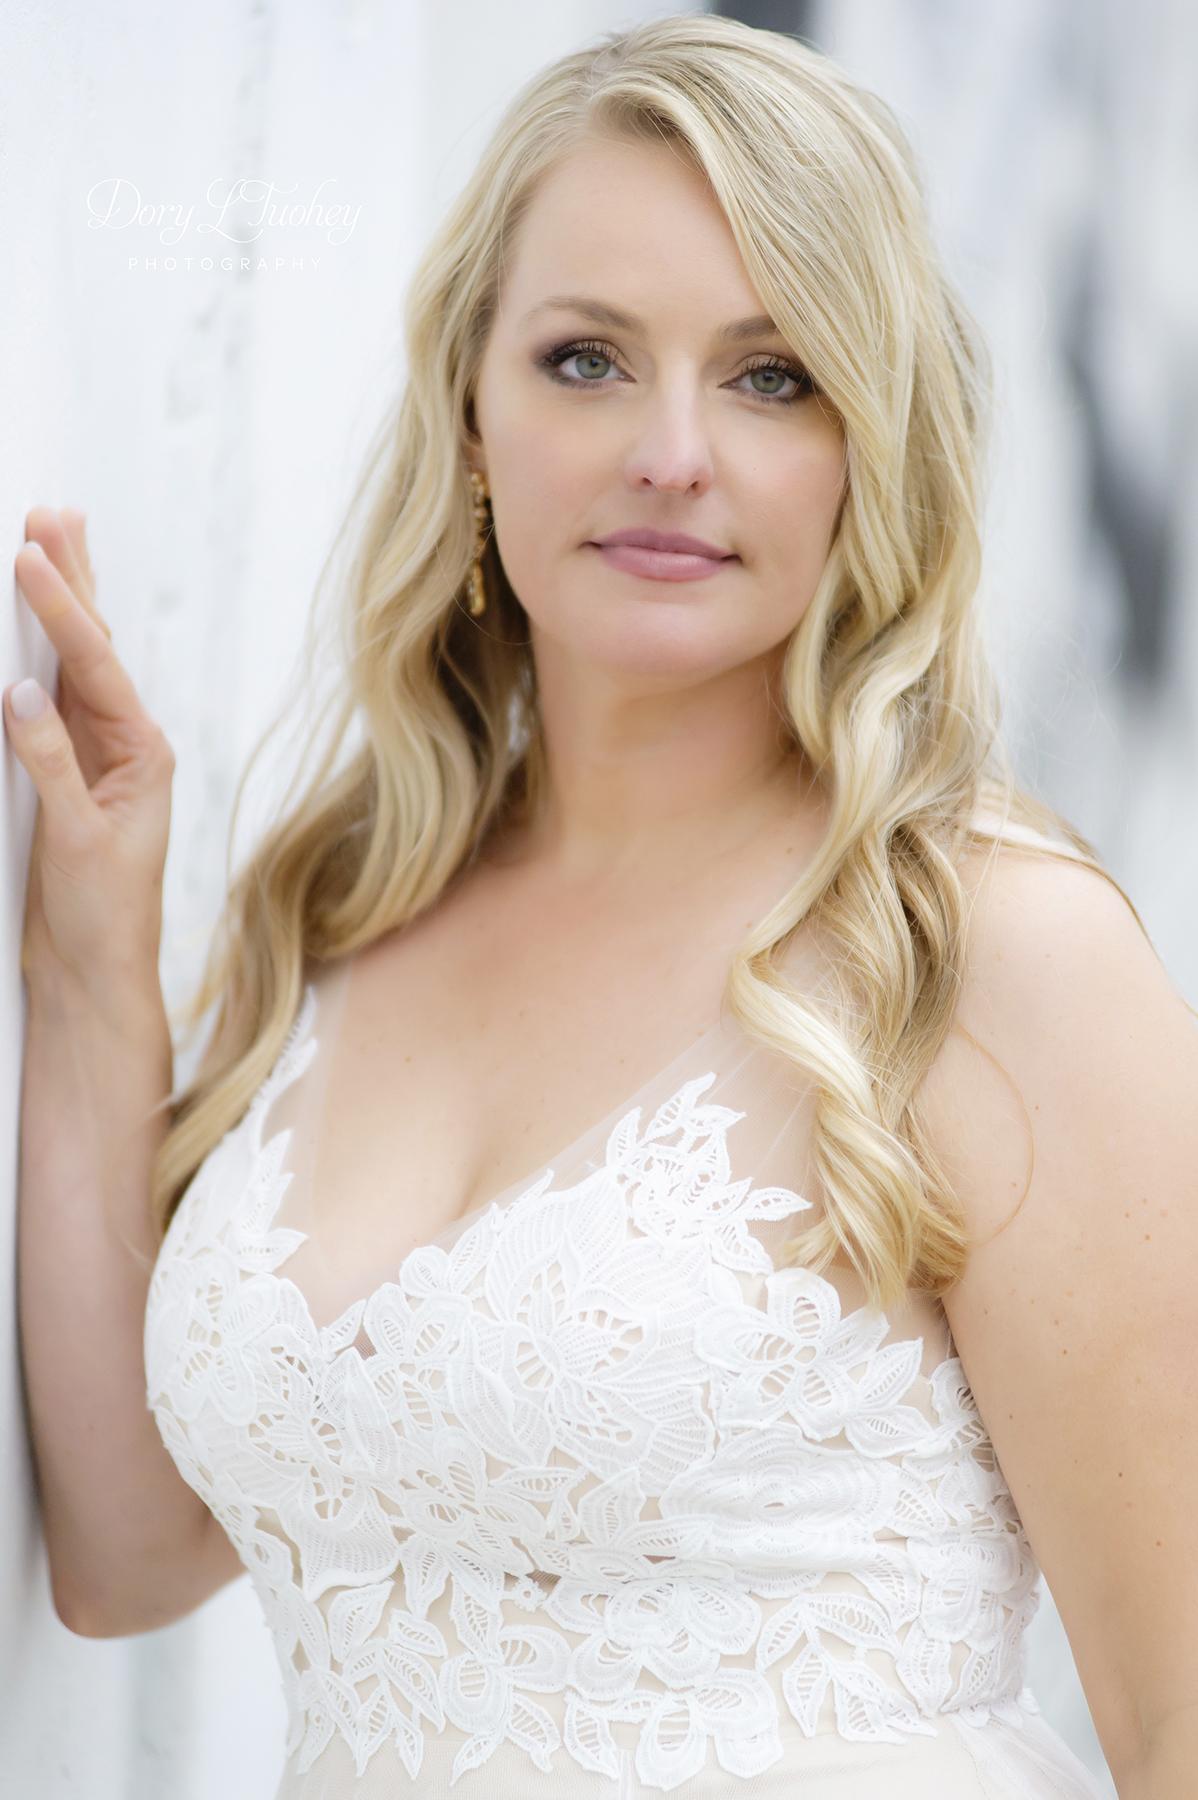 Rookery_chicago_dory_photographer_wedding_stairs_bhldn_love_dawson_11.jpg